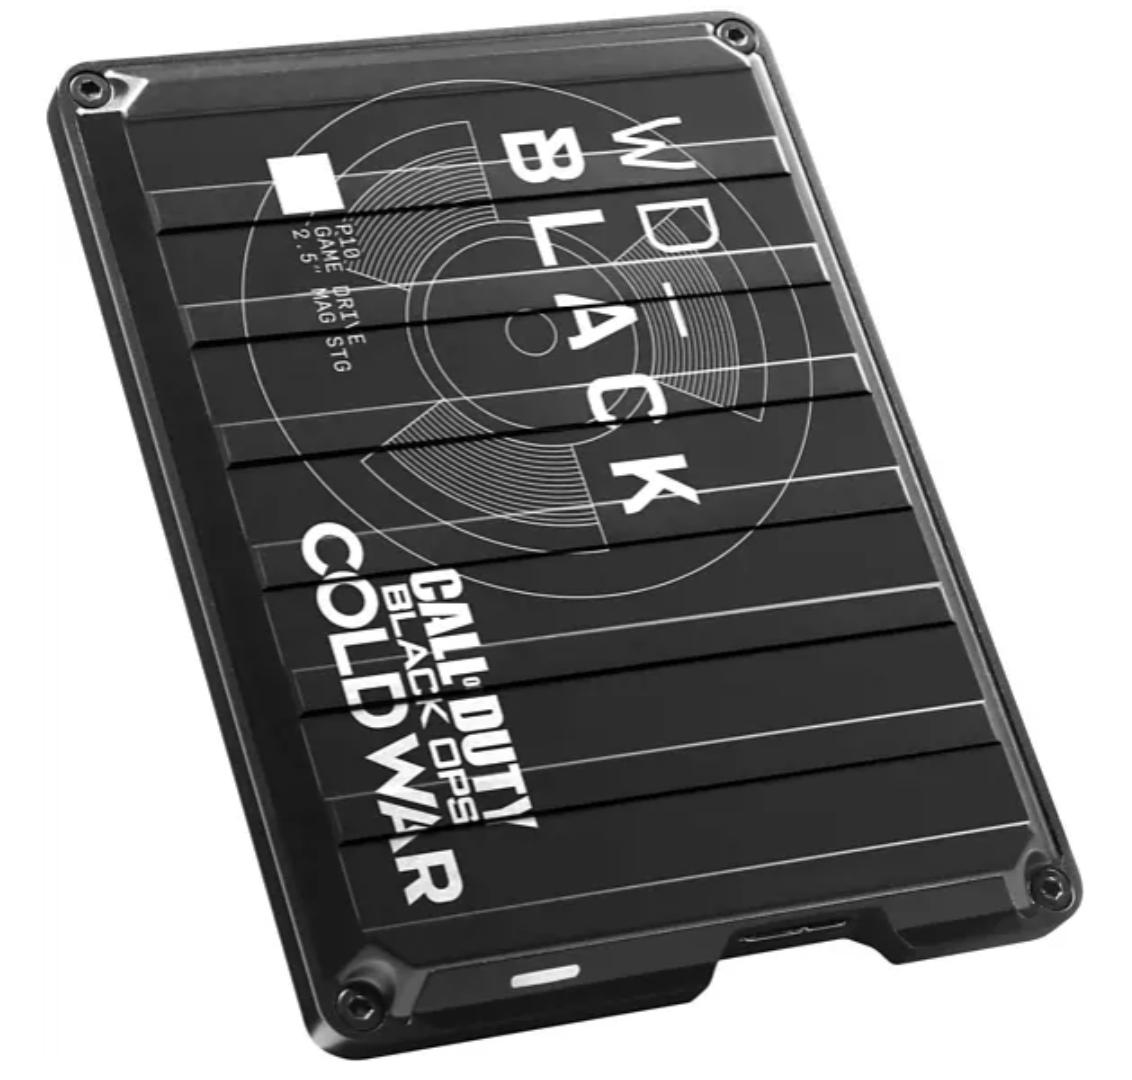 WD BLACK P10 2TB Game Drive Festplatte Call of Duty Special Edition für nur 59€ inkl. Versand